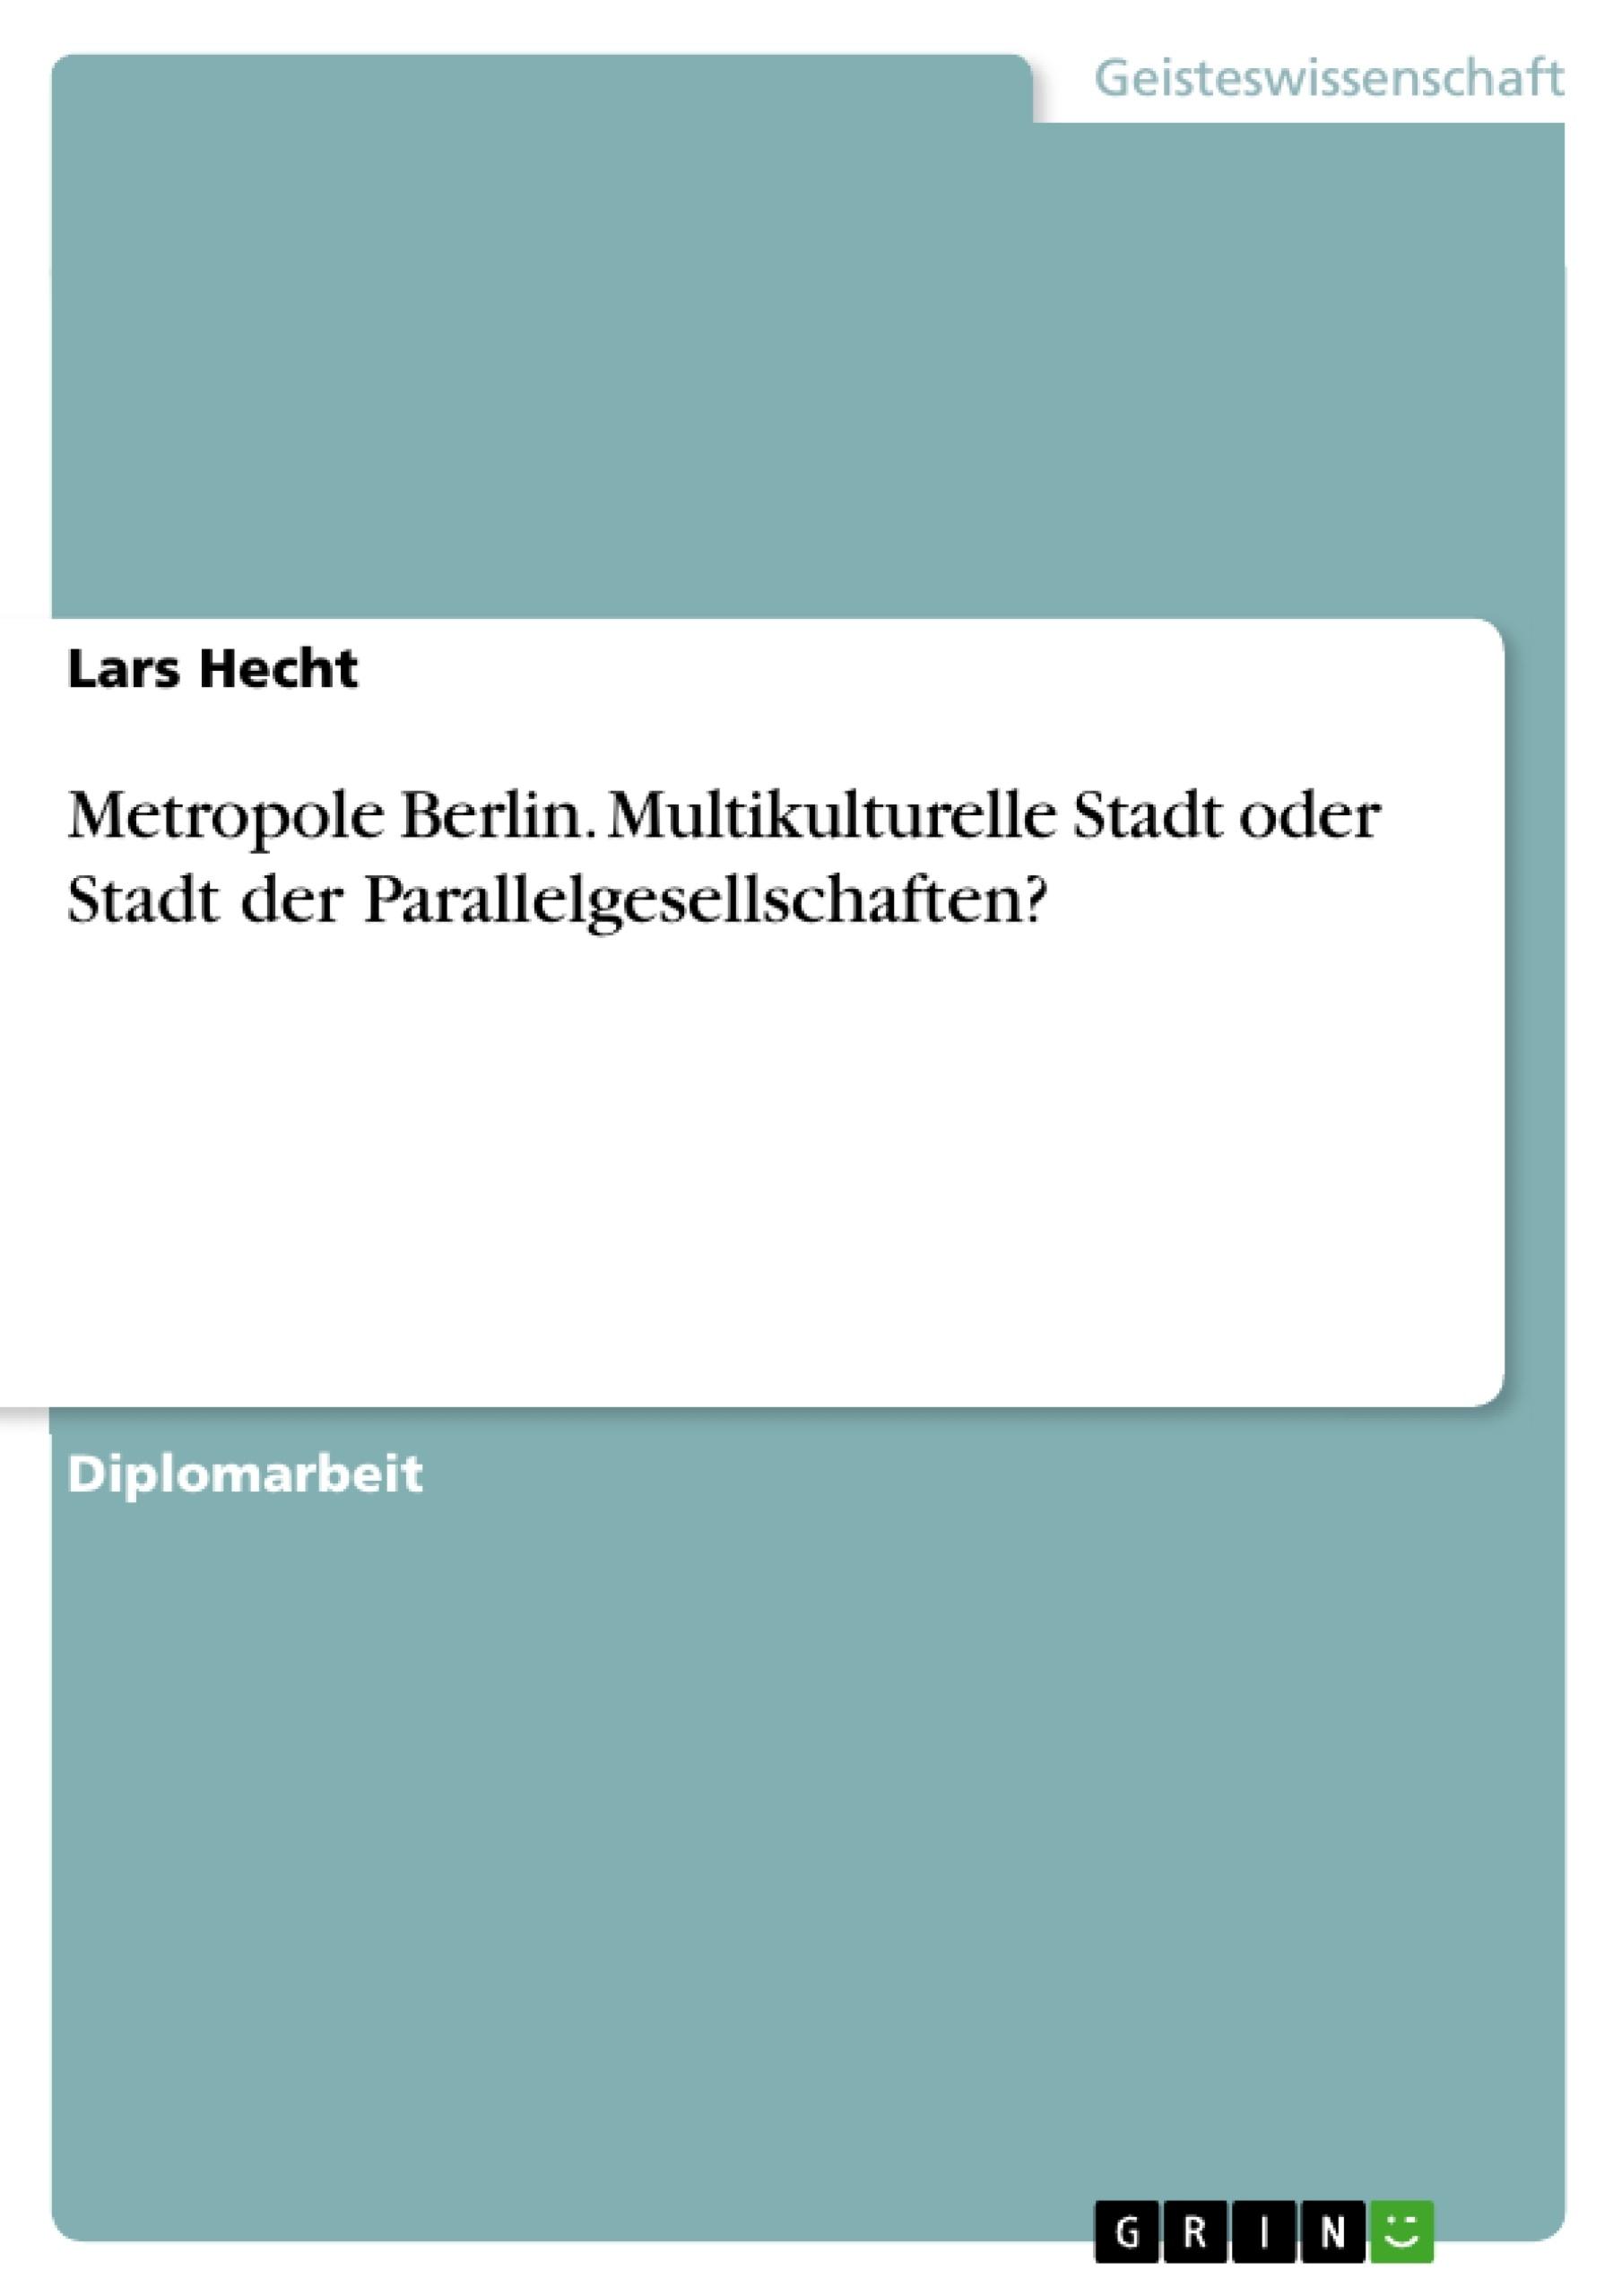 Titel: Metropole Berlin. Multikulturelle Stadt oder Stadt der Parallelgesellschaften?